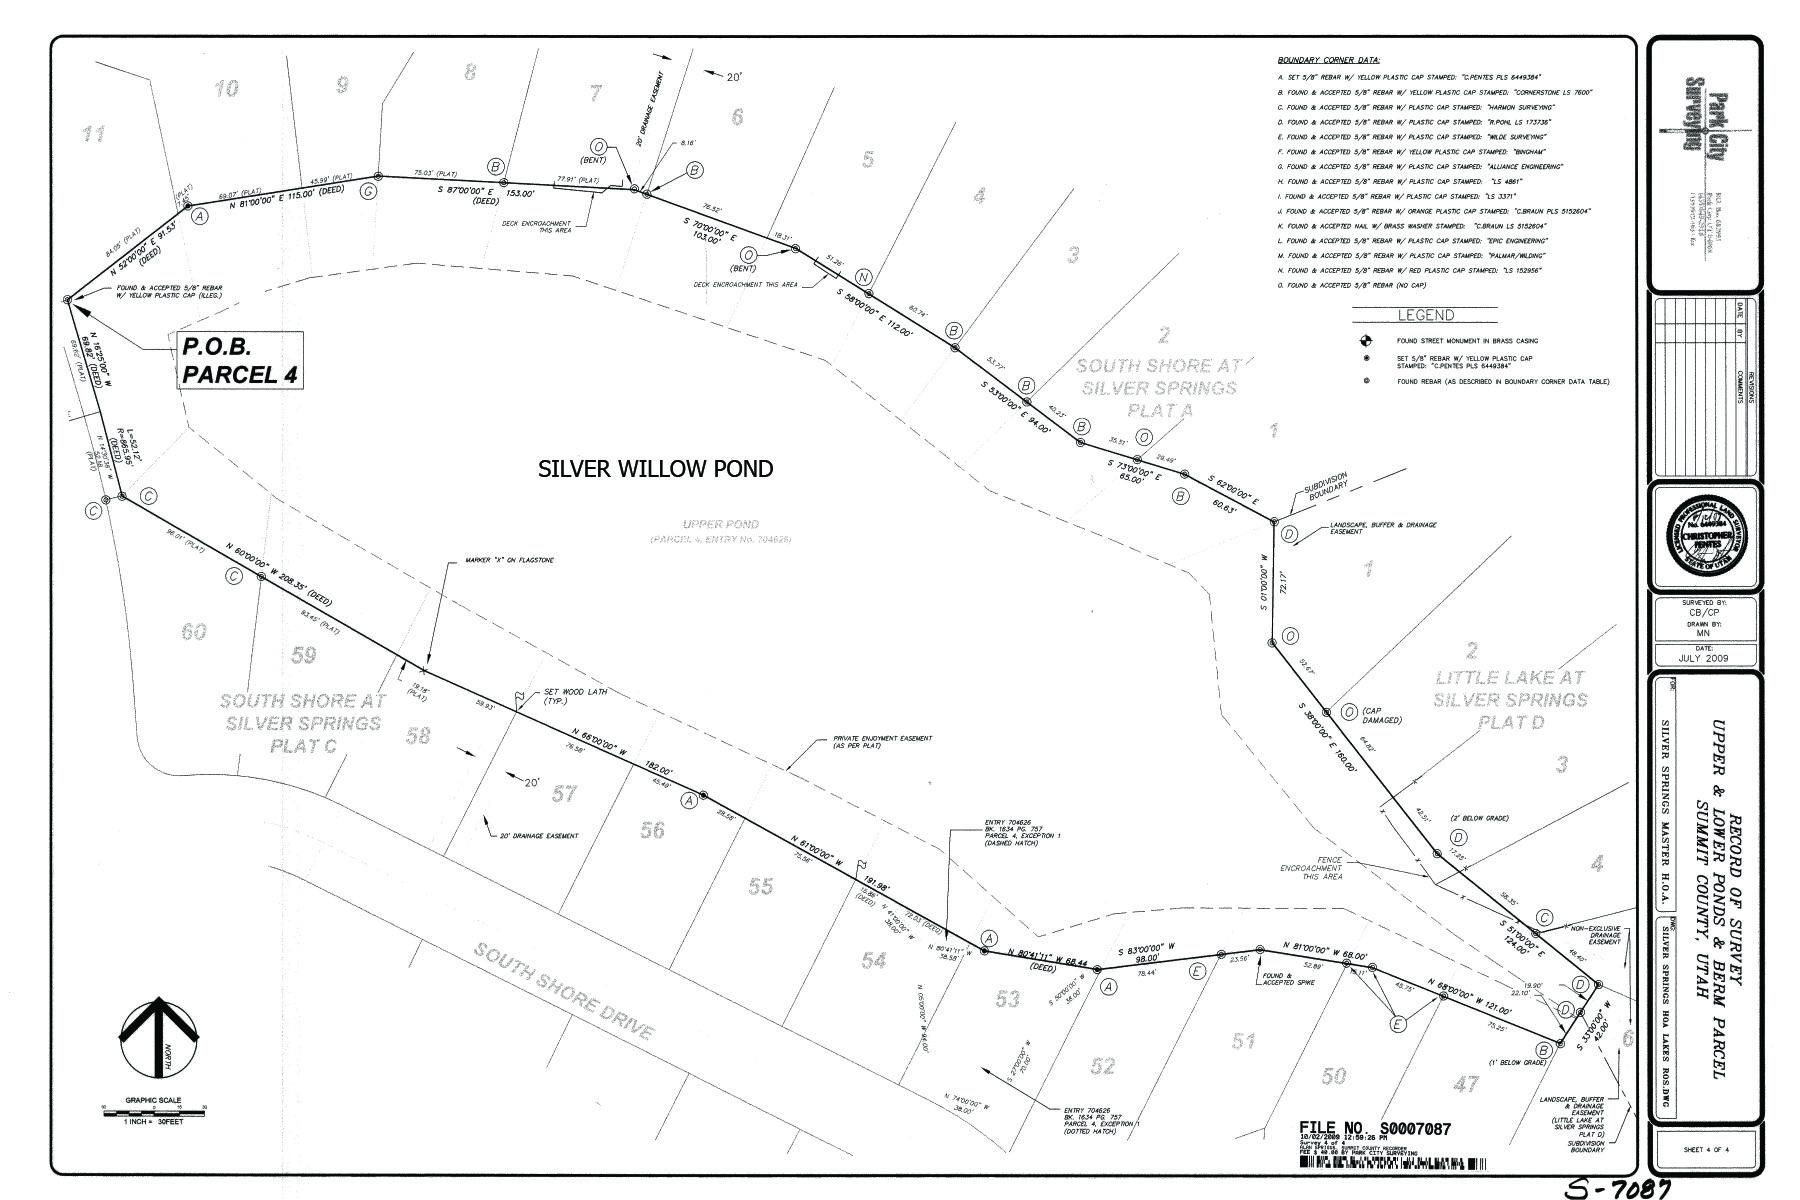 2009-s-7087-map4-lakes-survey8x12.jpg